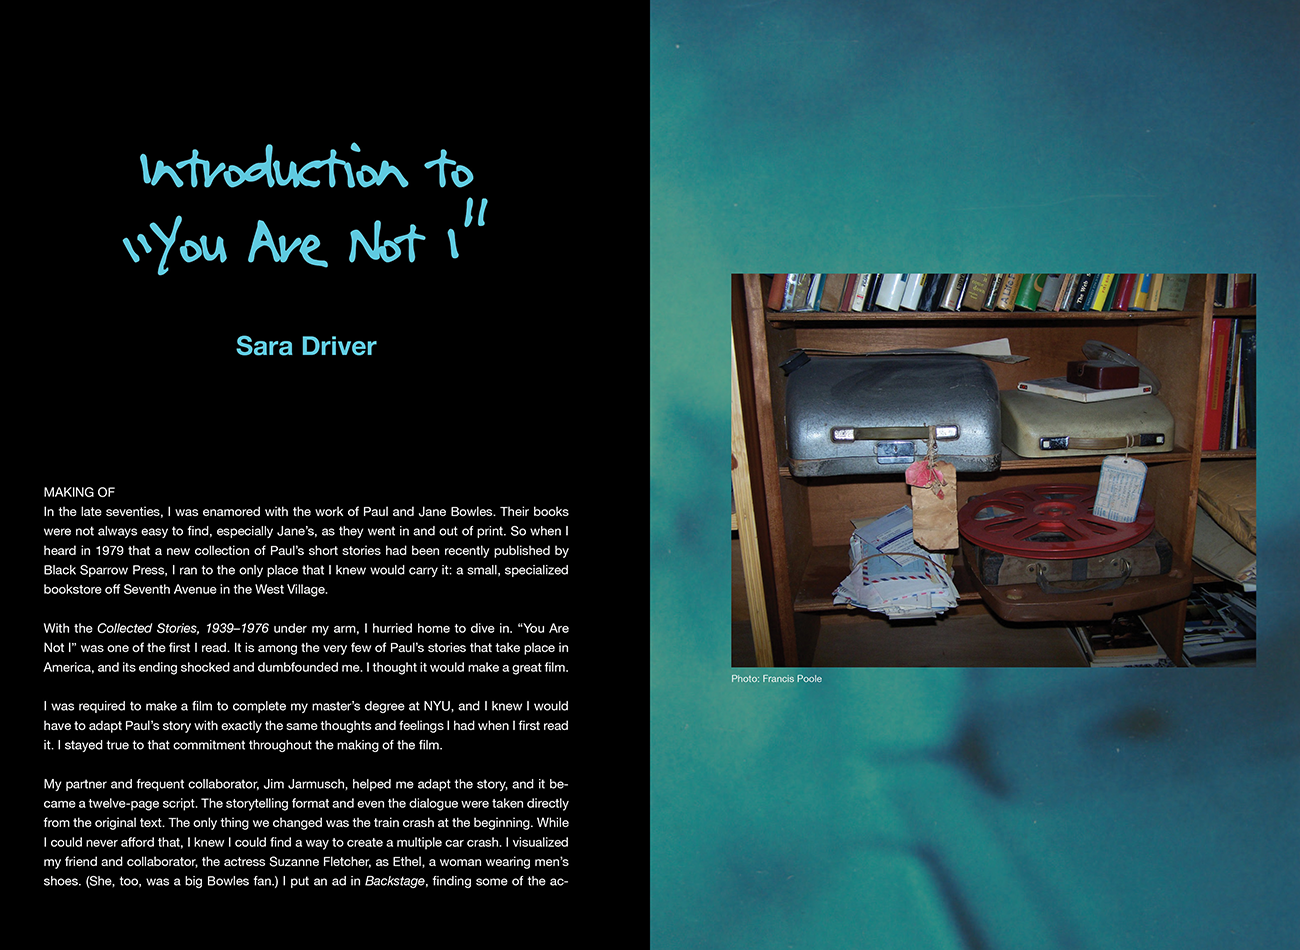 Story artwork by guest designer Jim Jarmusch